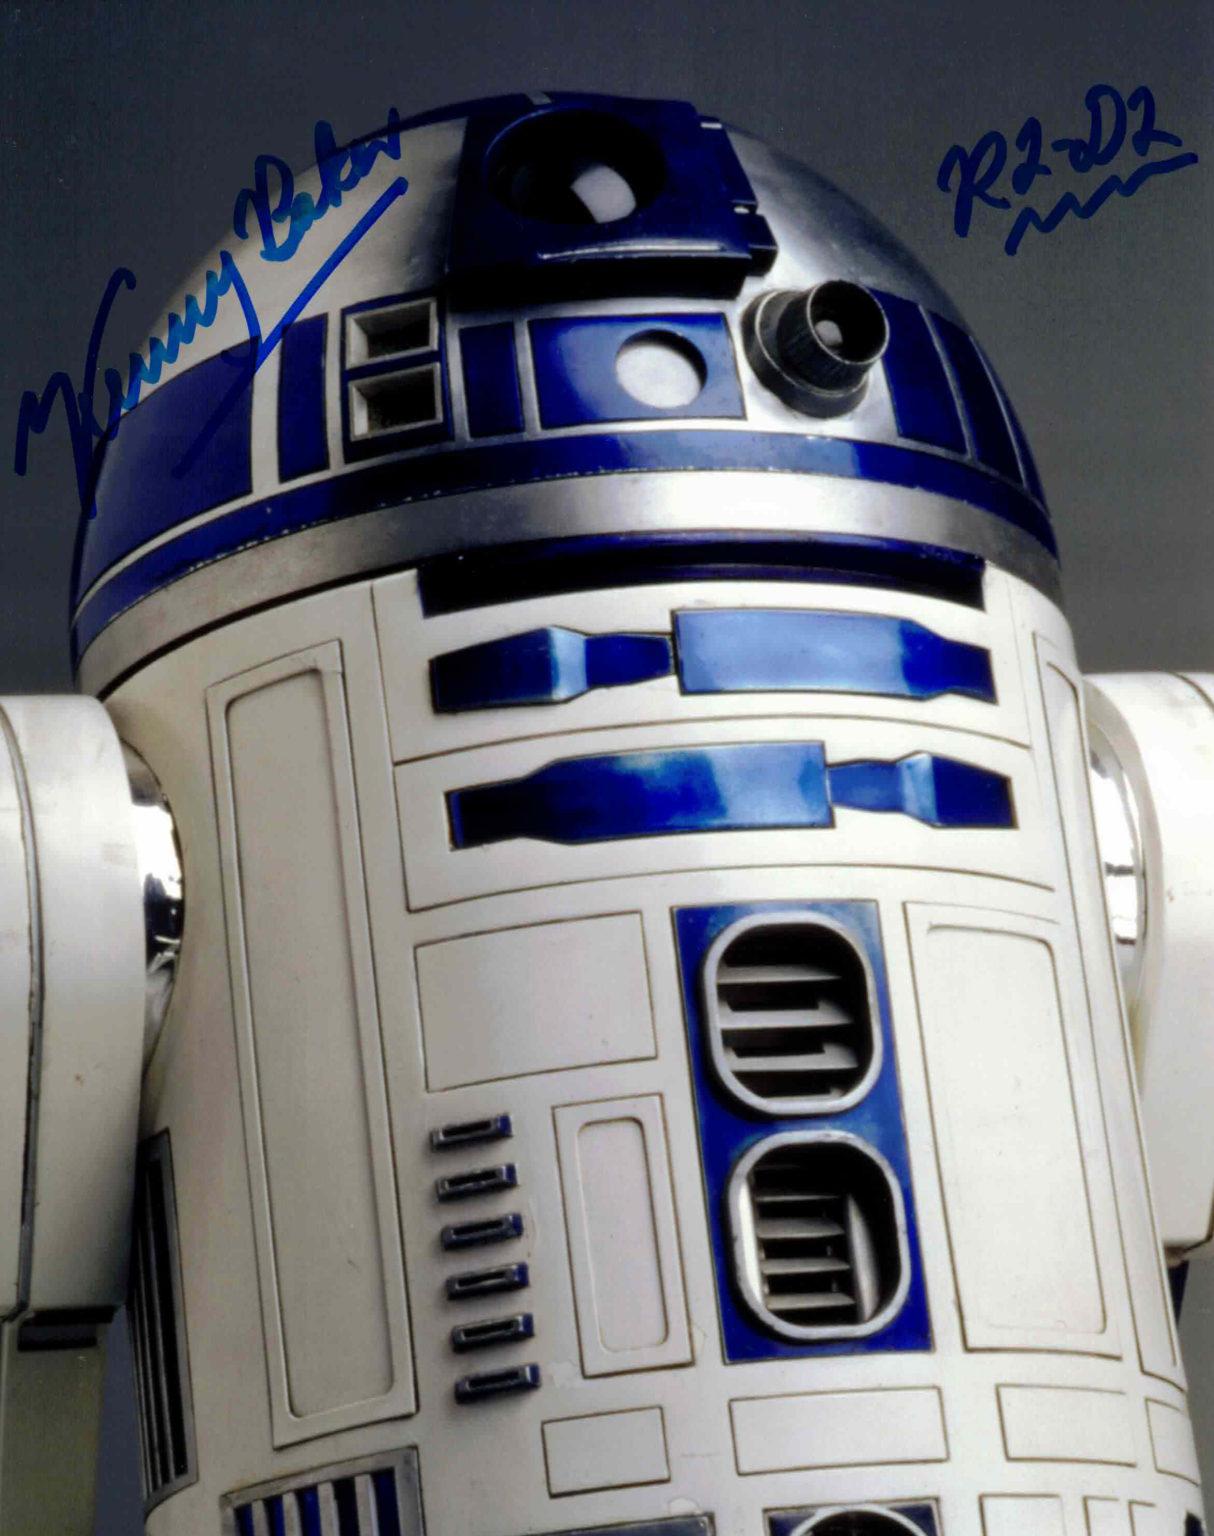 Kenny Baker / R2-D2, Star Wars - autogram